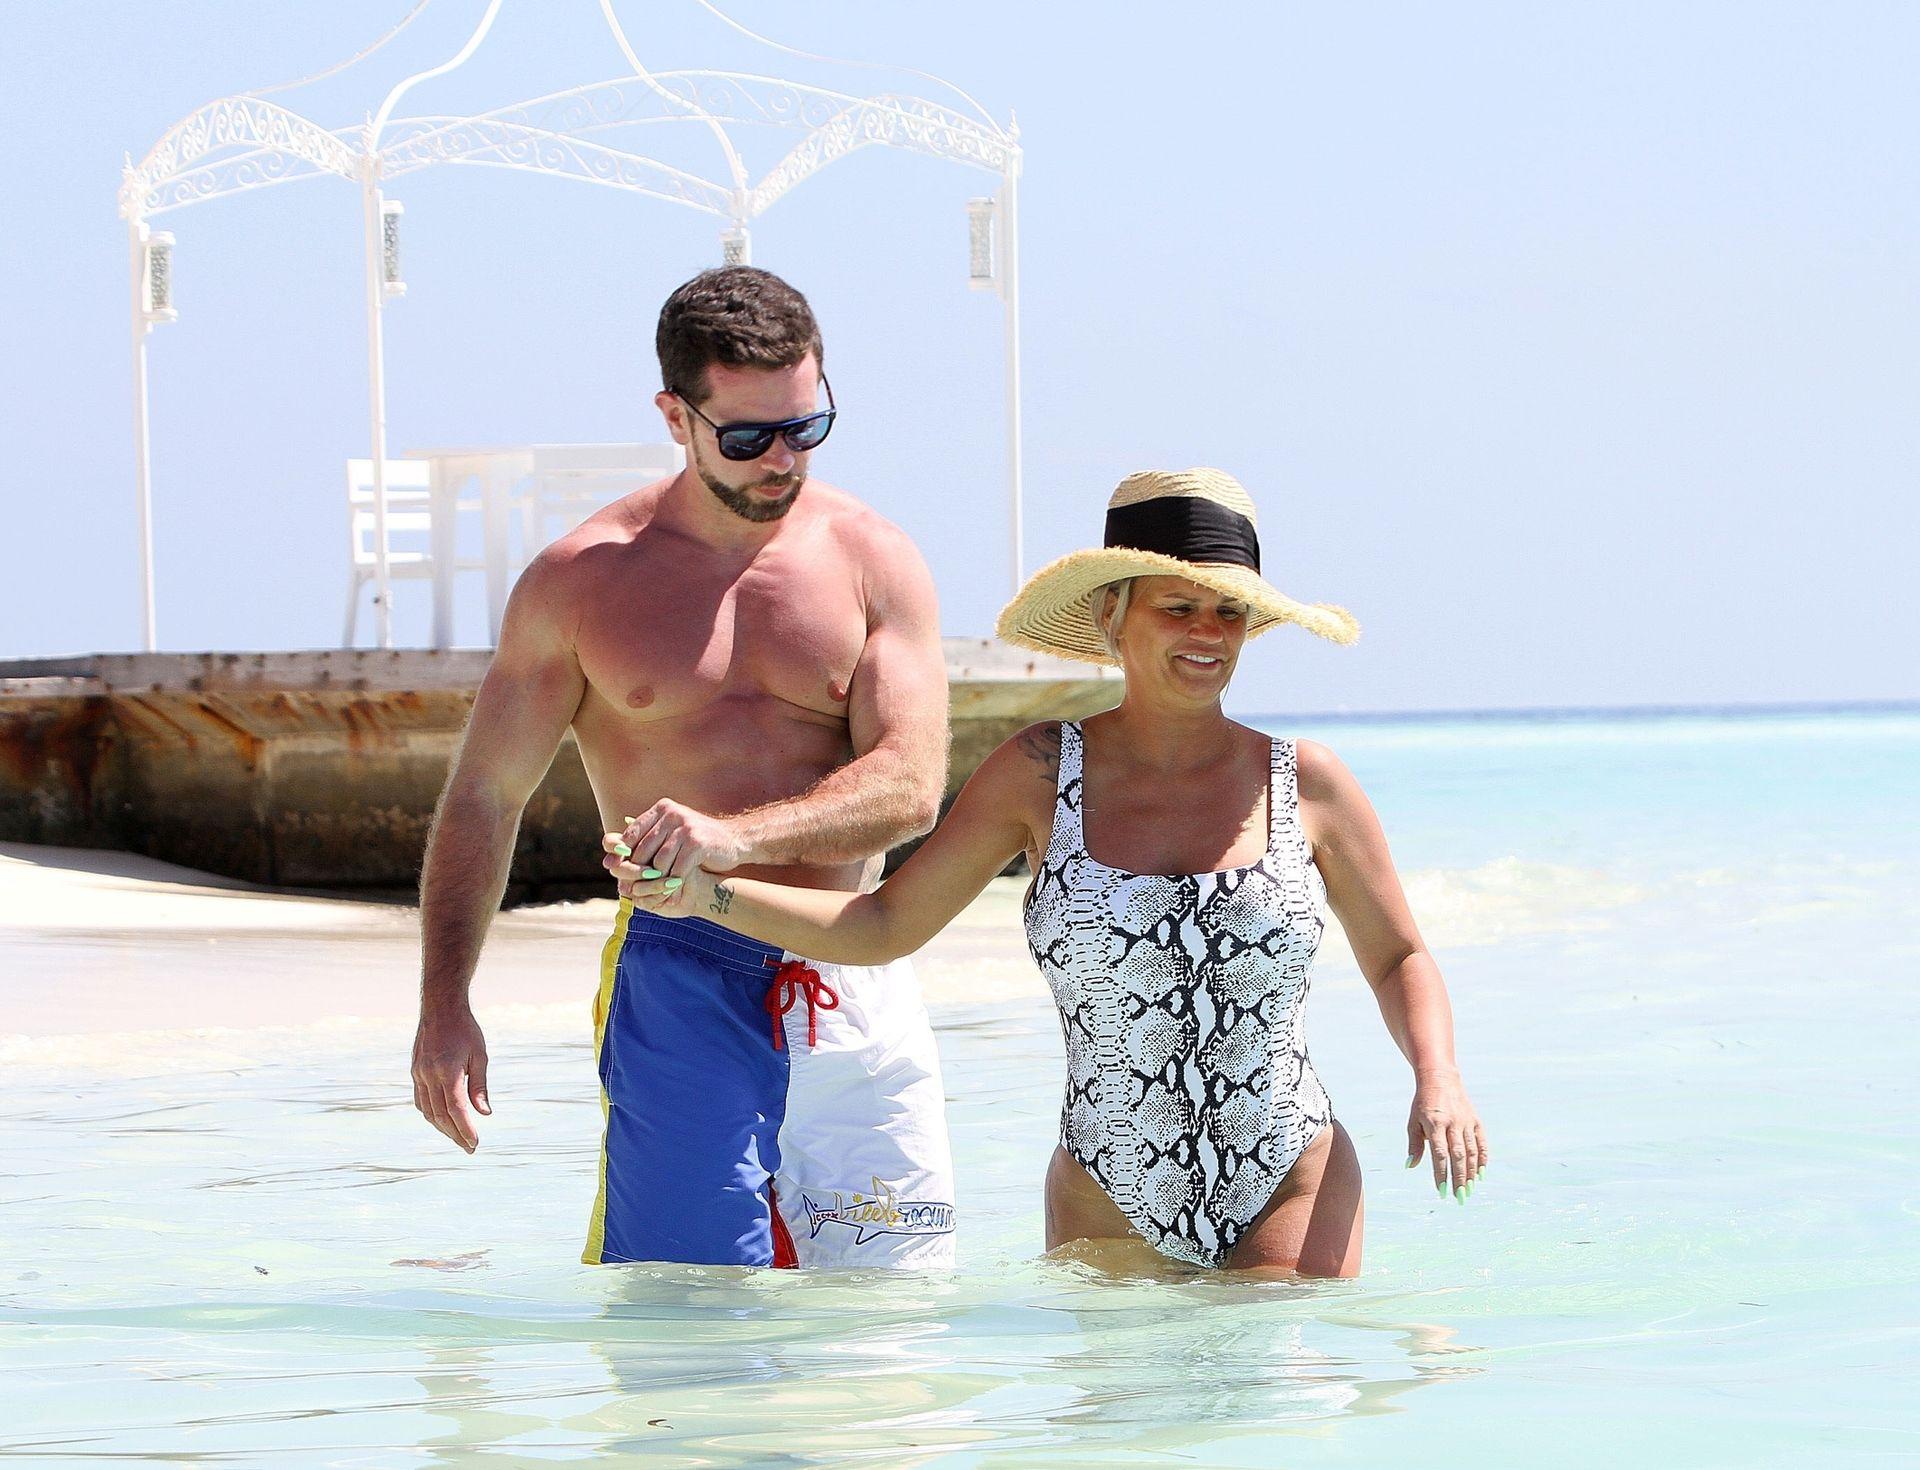 Kerry Katona & Ryan Mahoney Hit The Beach On Holiday At Their Luxury 5 Star Resort Ayada Maldives 0027